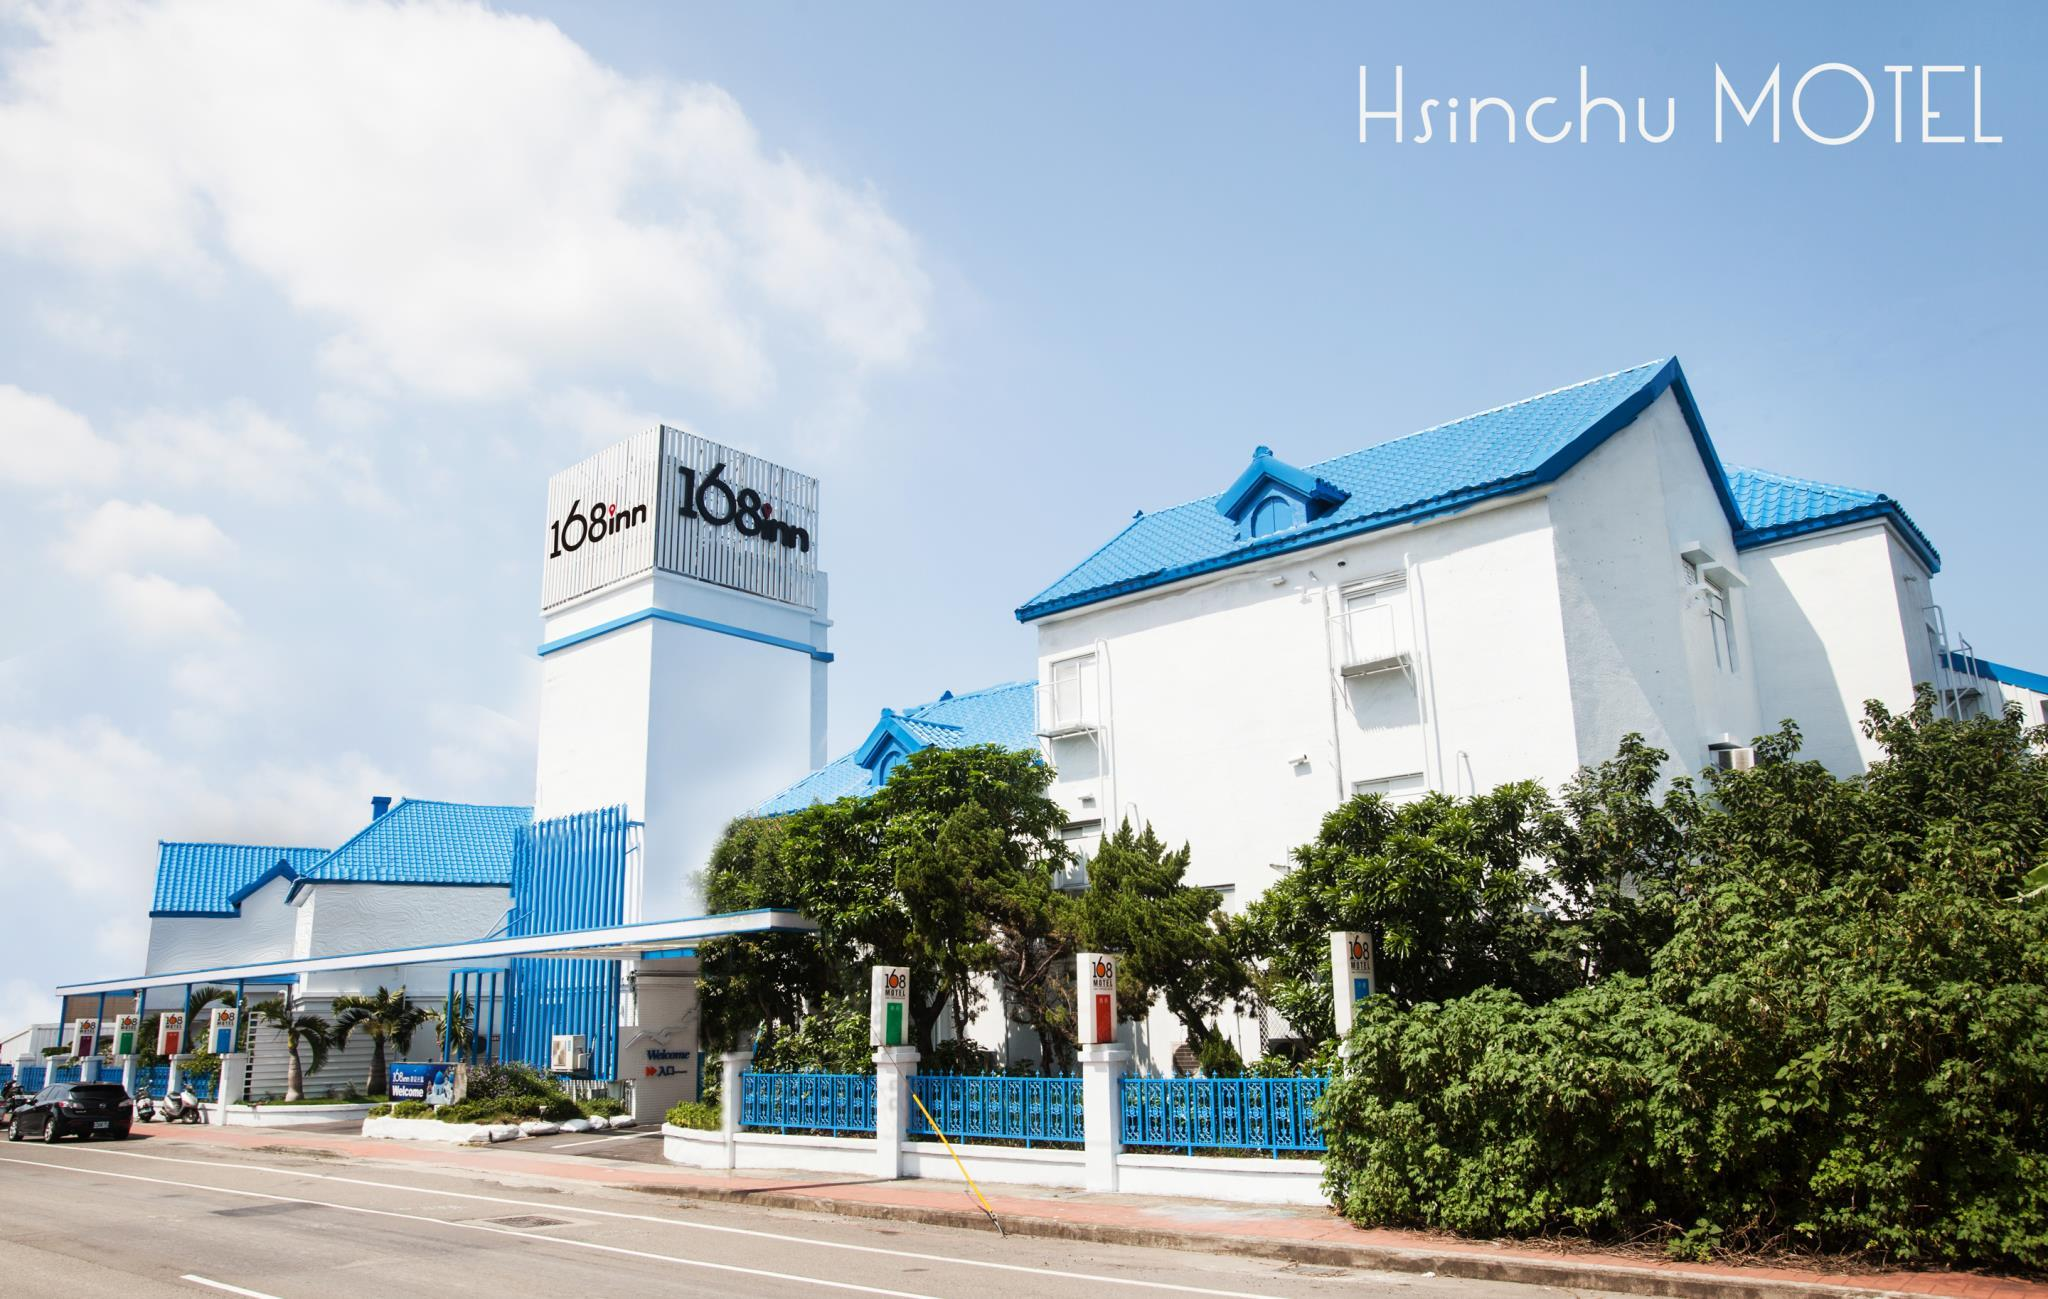 168 Motel - Hsinchu, Hsinchu County